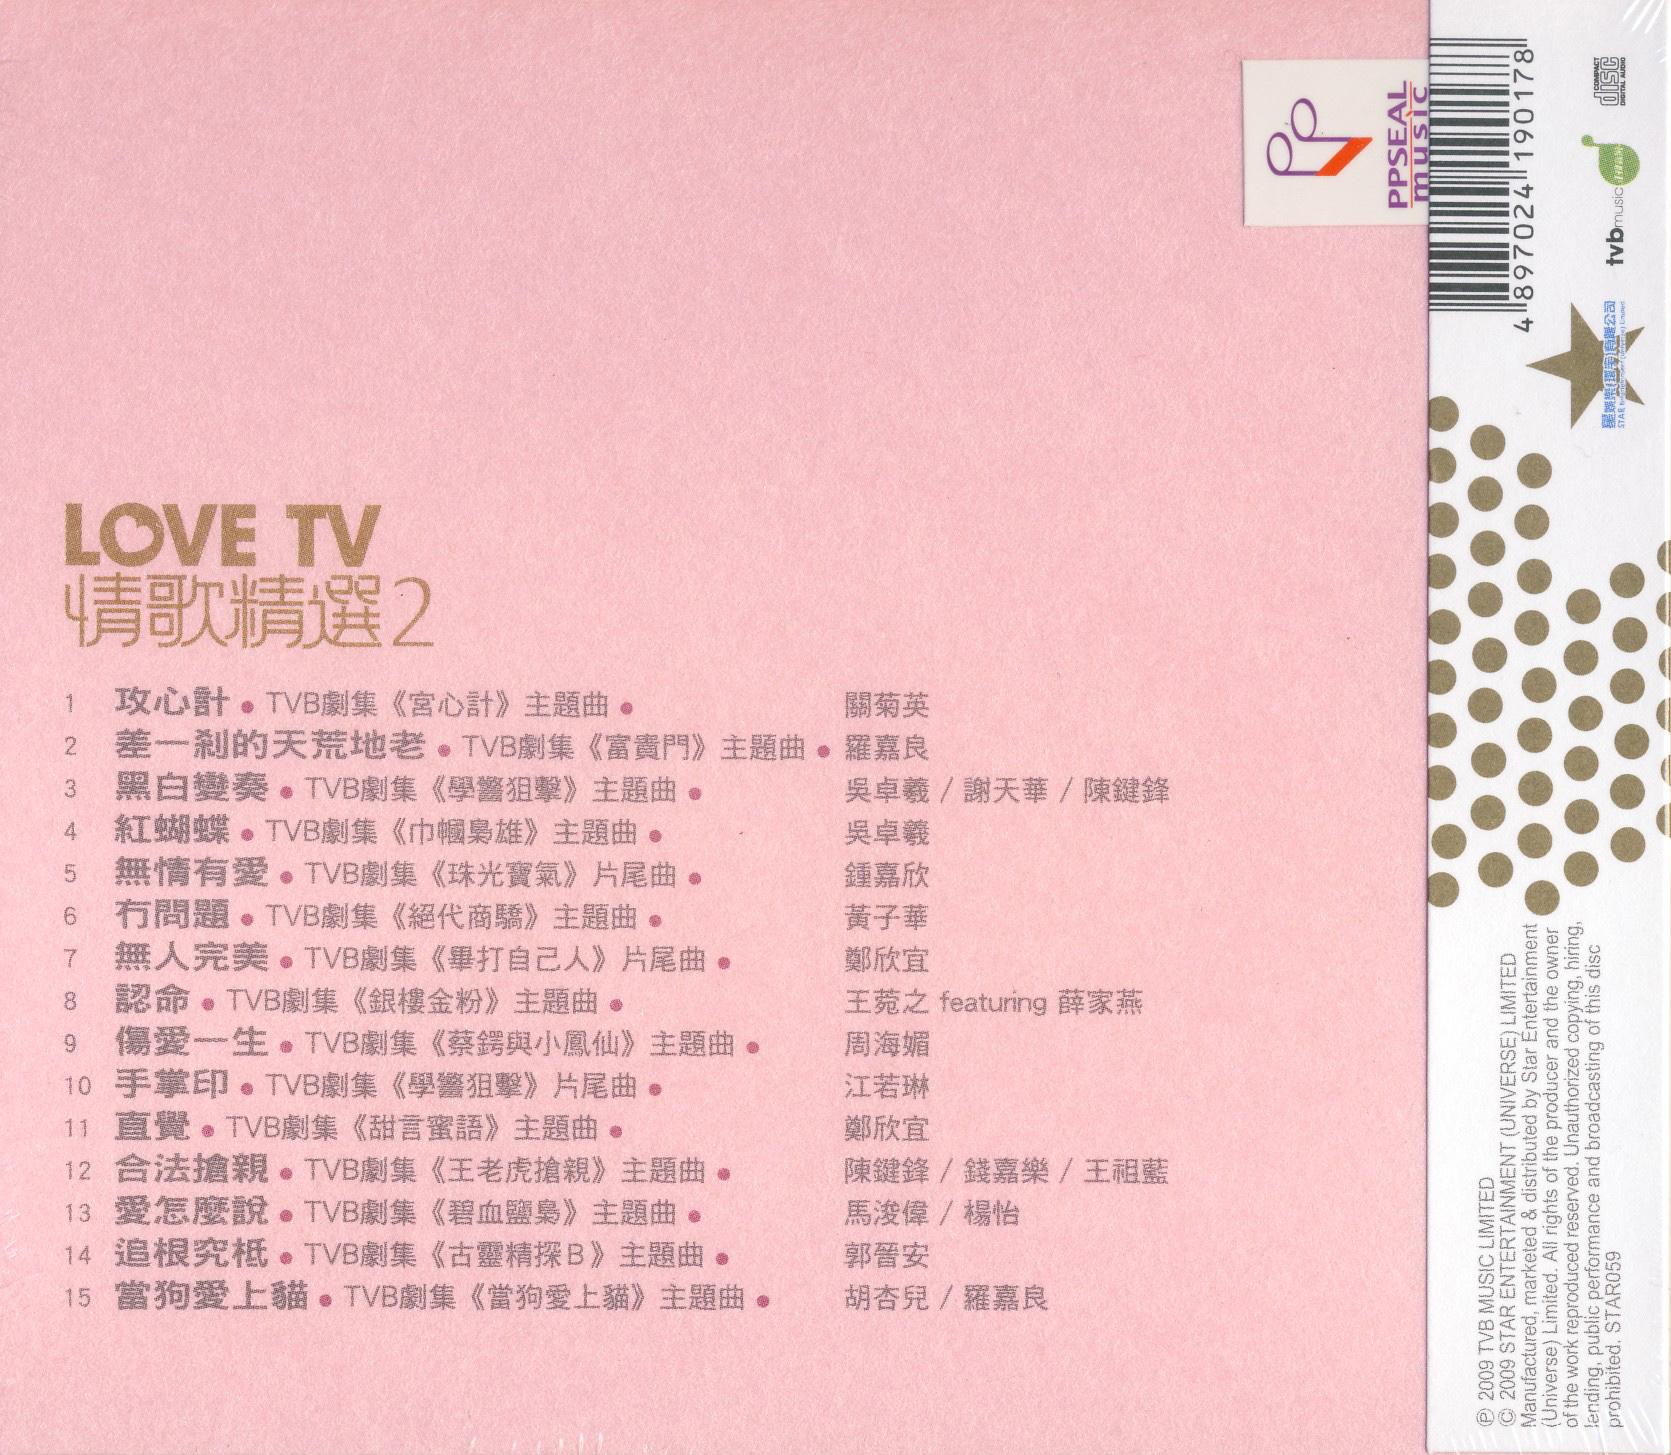 Love TV 情歌精选 2